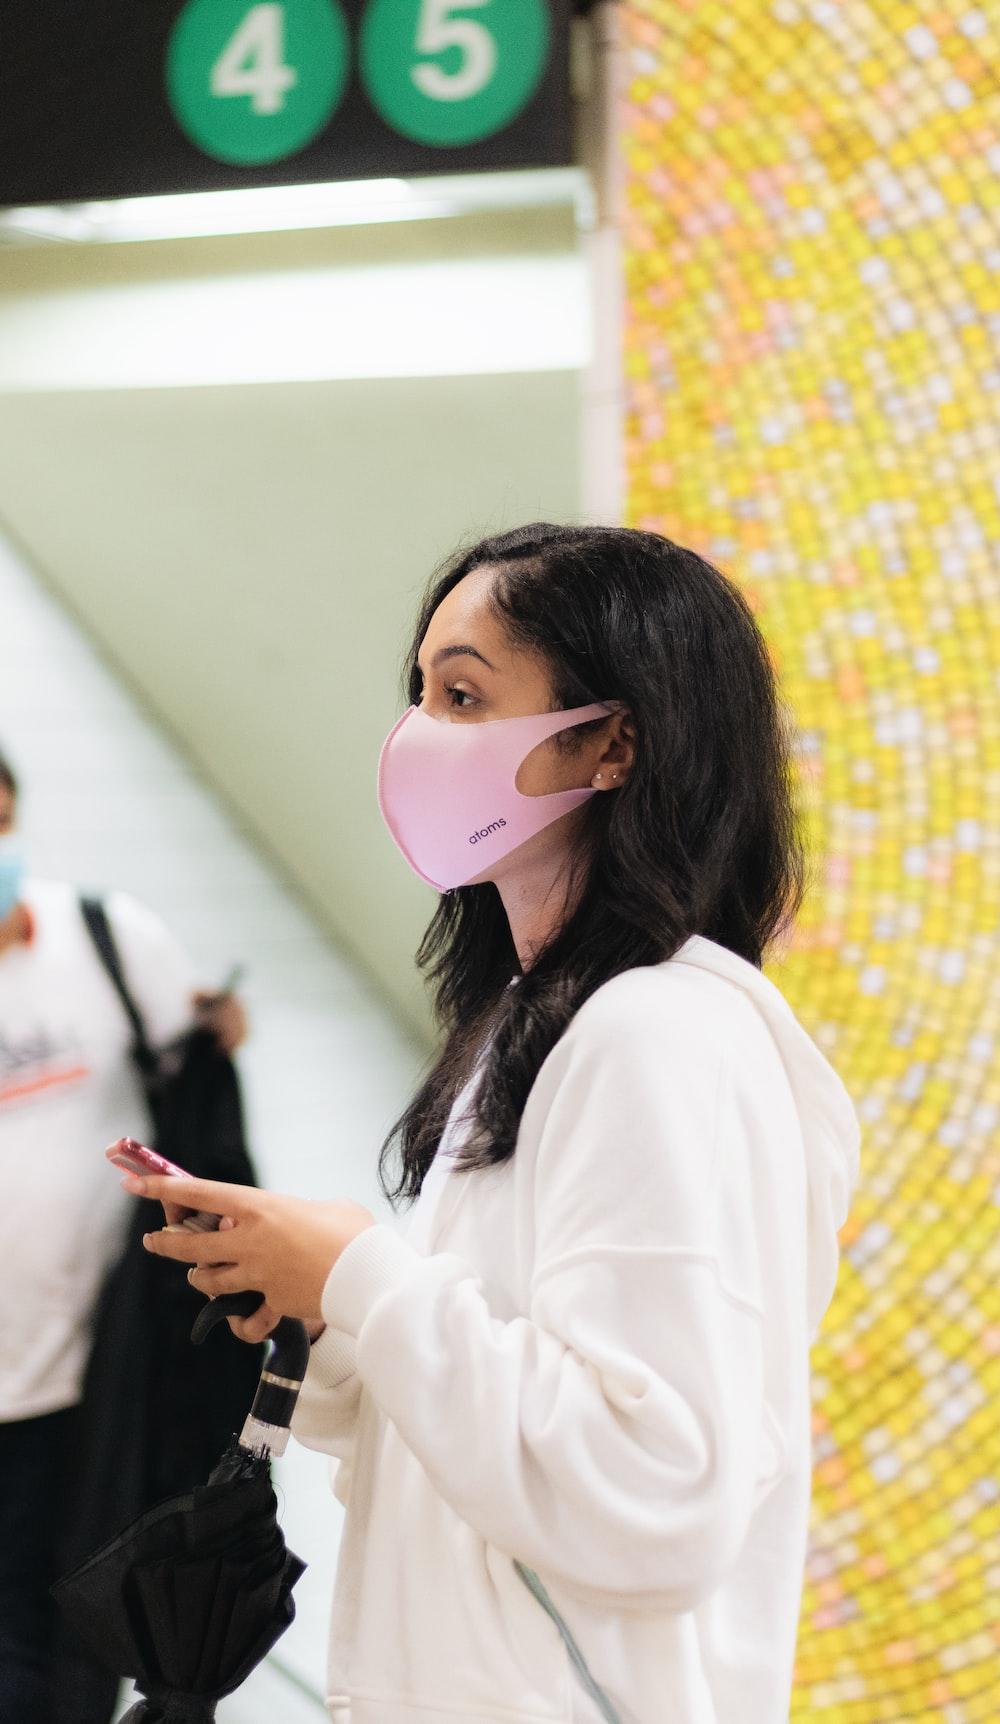 woman in white long sleeve shirt wearing white mask